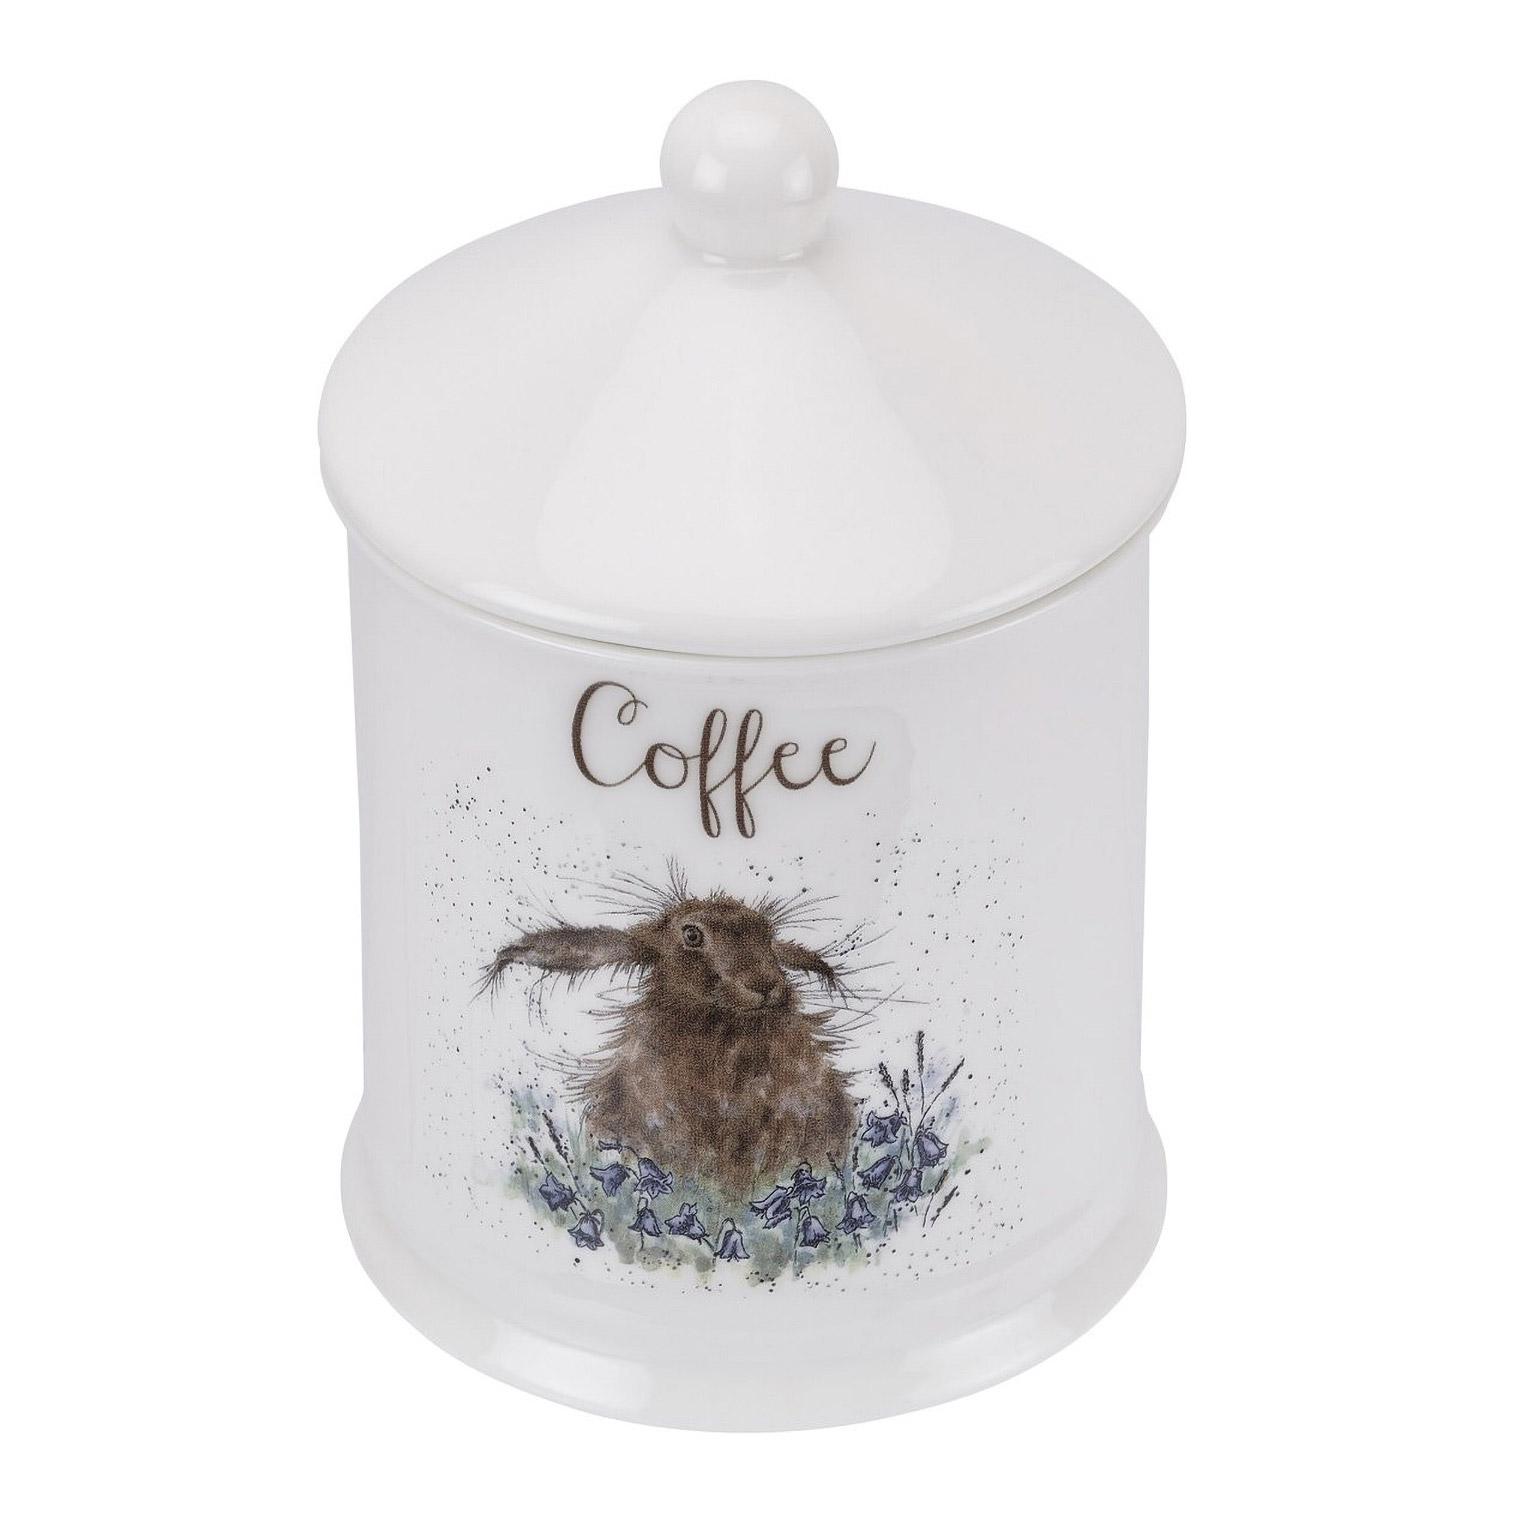 Банка для кофе с крышкой Забавная фауна Royal Worcester 14.5 см банка для кофе easy life время кофе 21 х 13 х 8 см